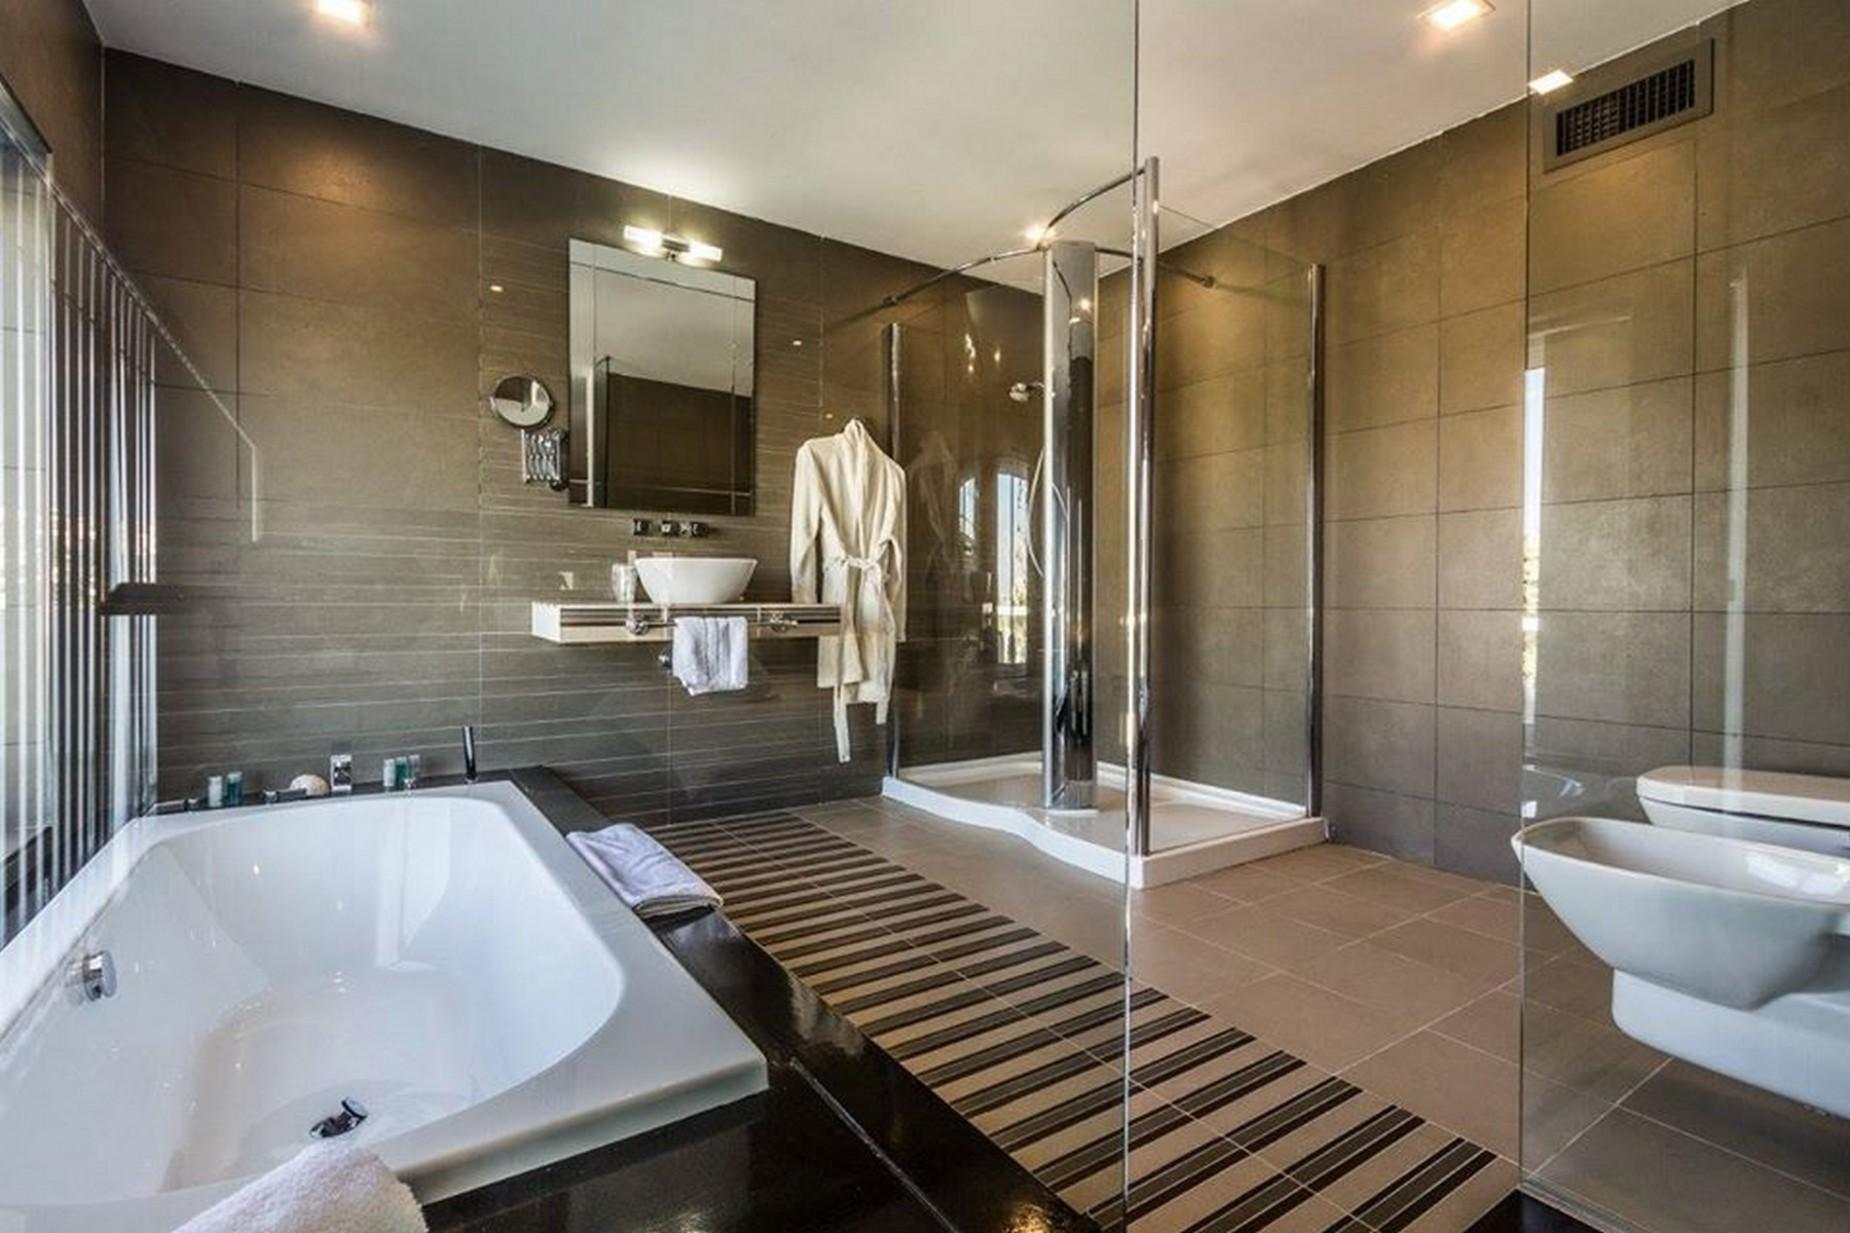 4 bed Villa For Rent in Mellieha, Mellieha - thumb 12